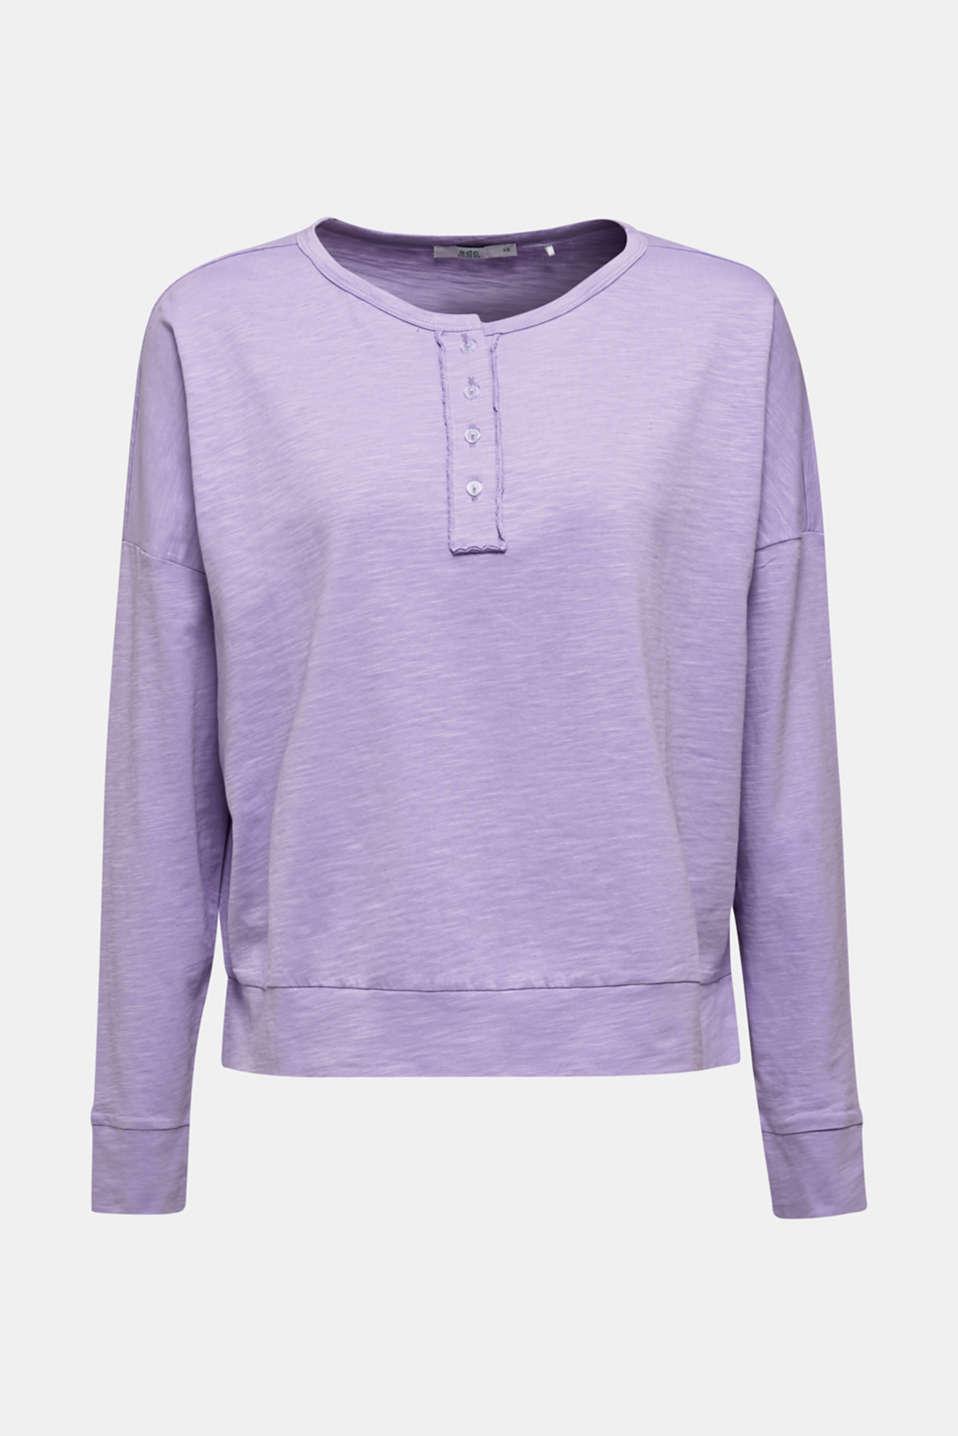 Slub jersey Henley top, 100% cotton, LILAC, detail image number 6